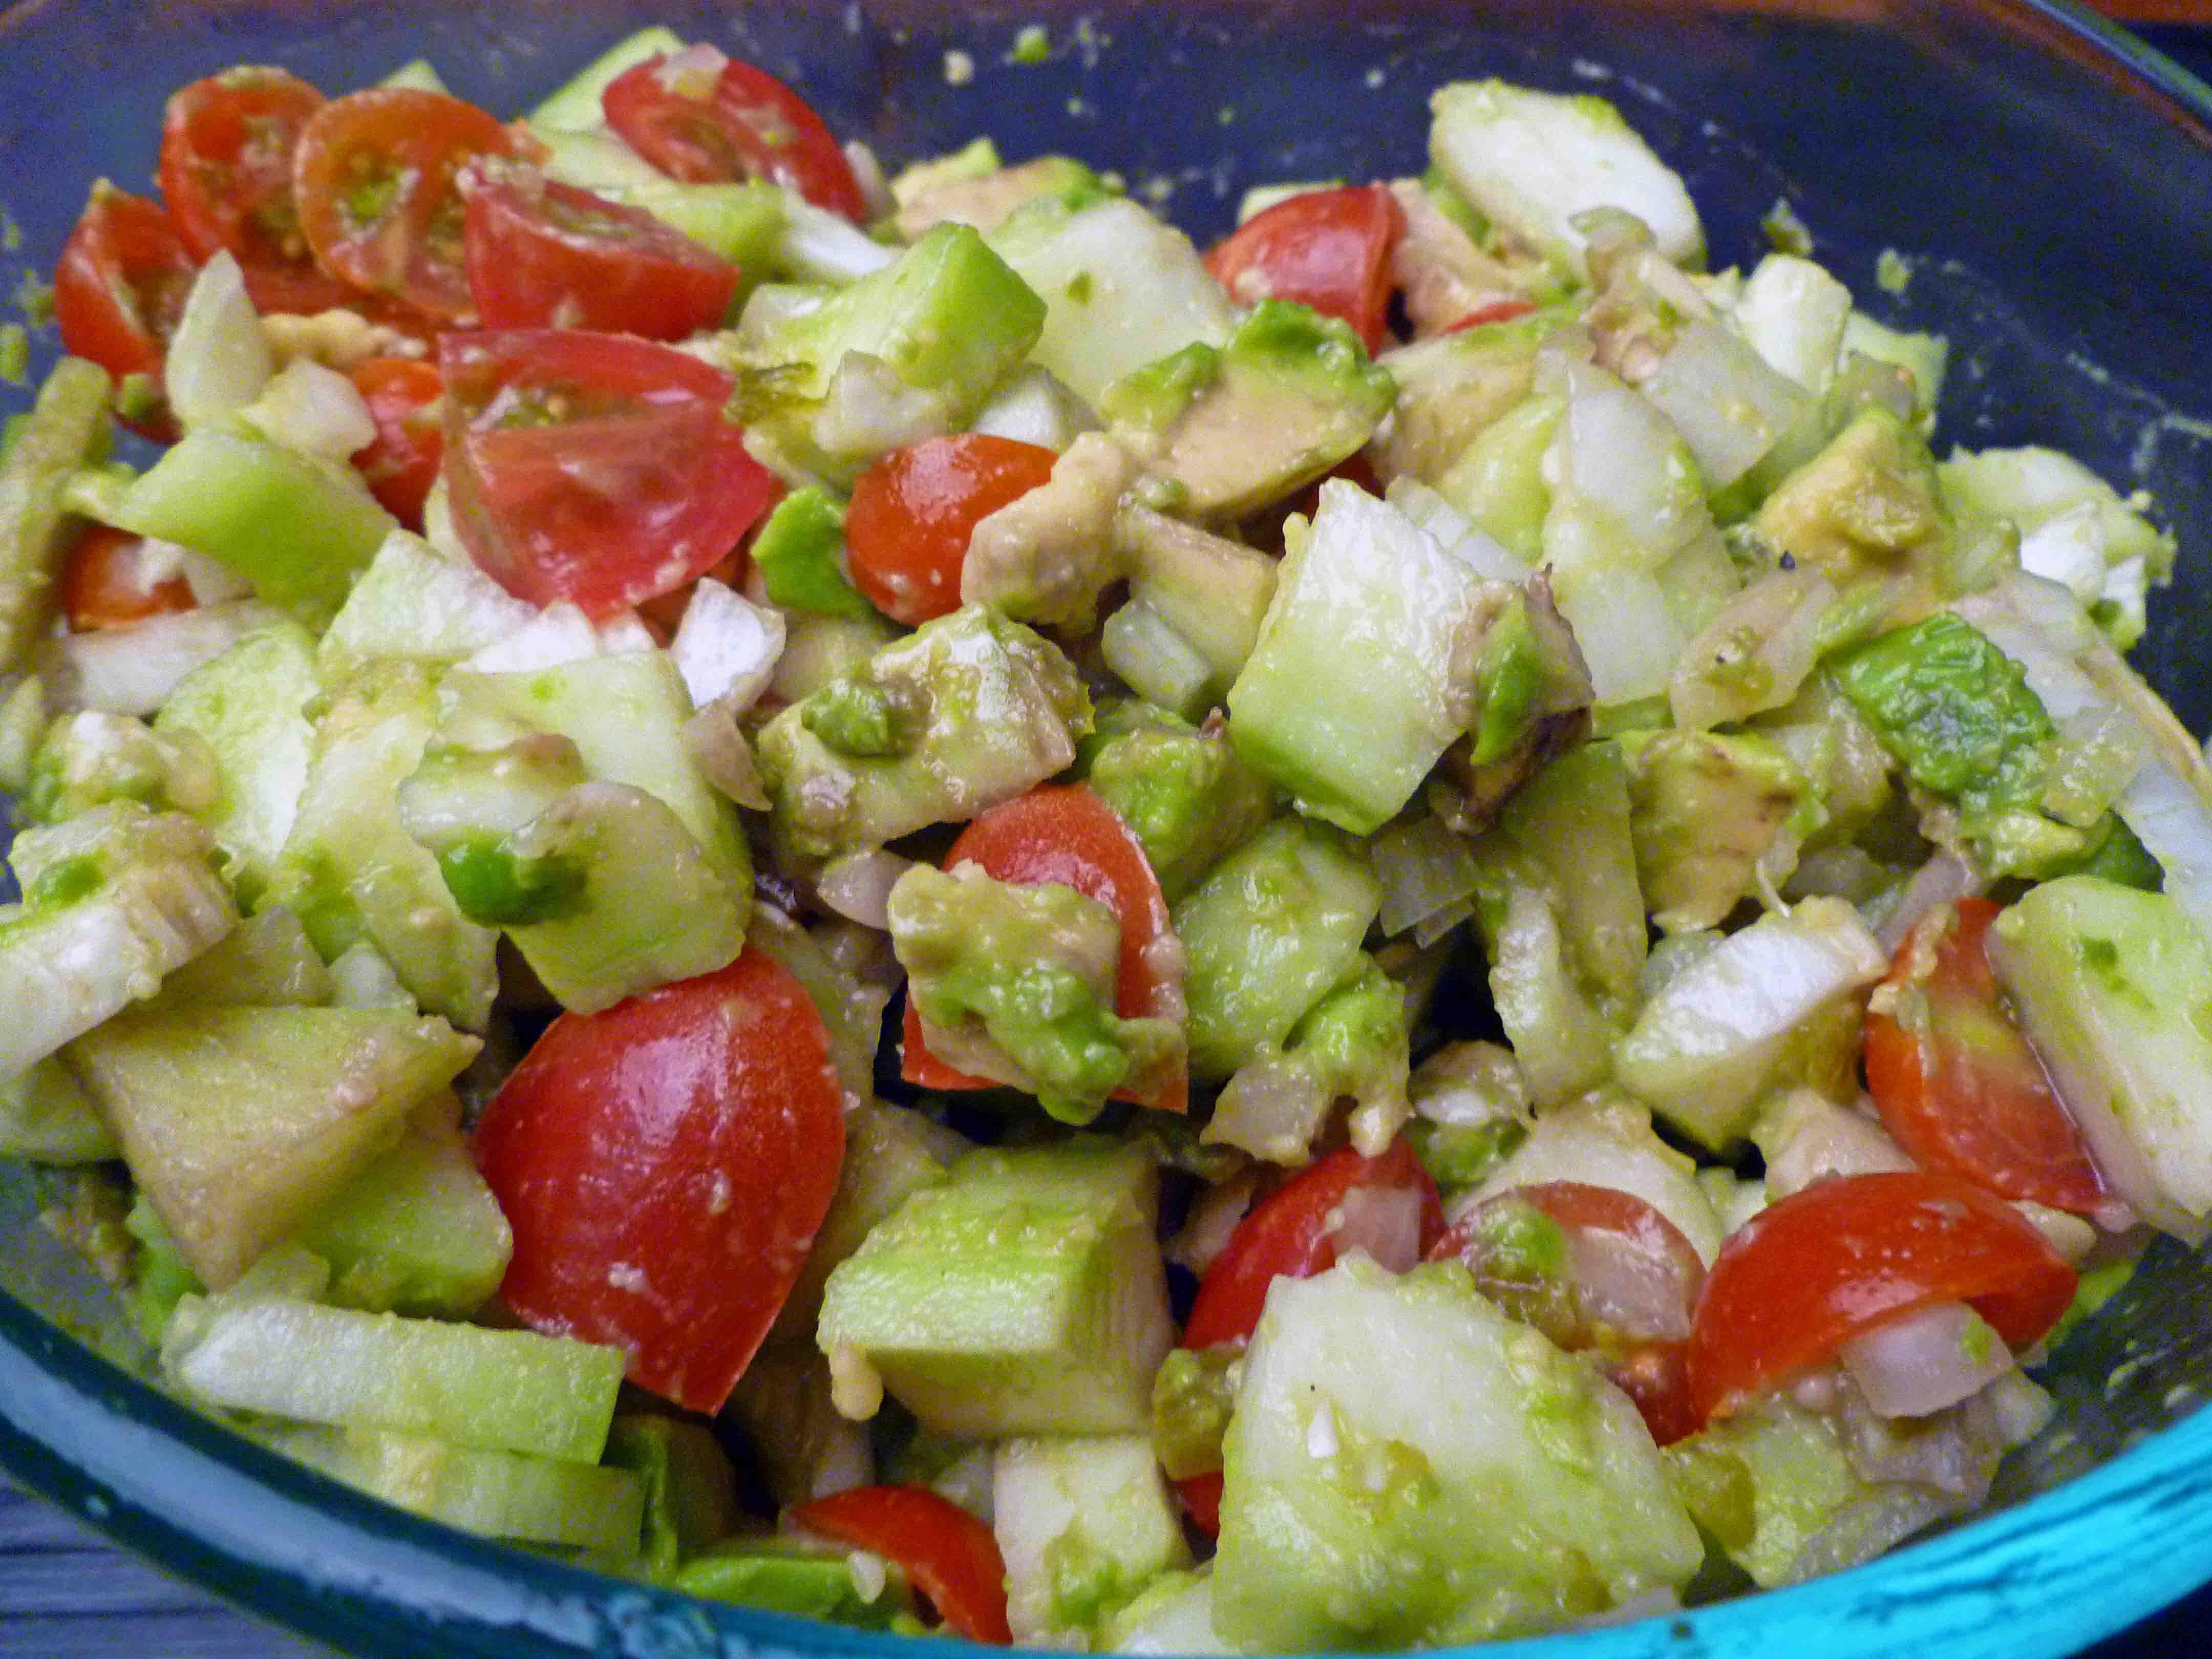 Cucumber, Avocado, Tomato Salad | Centex Cooks